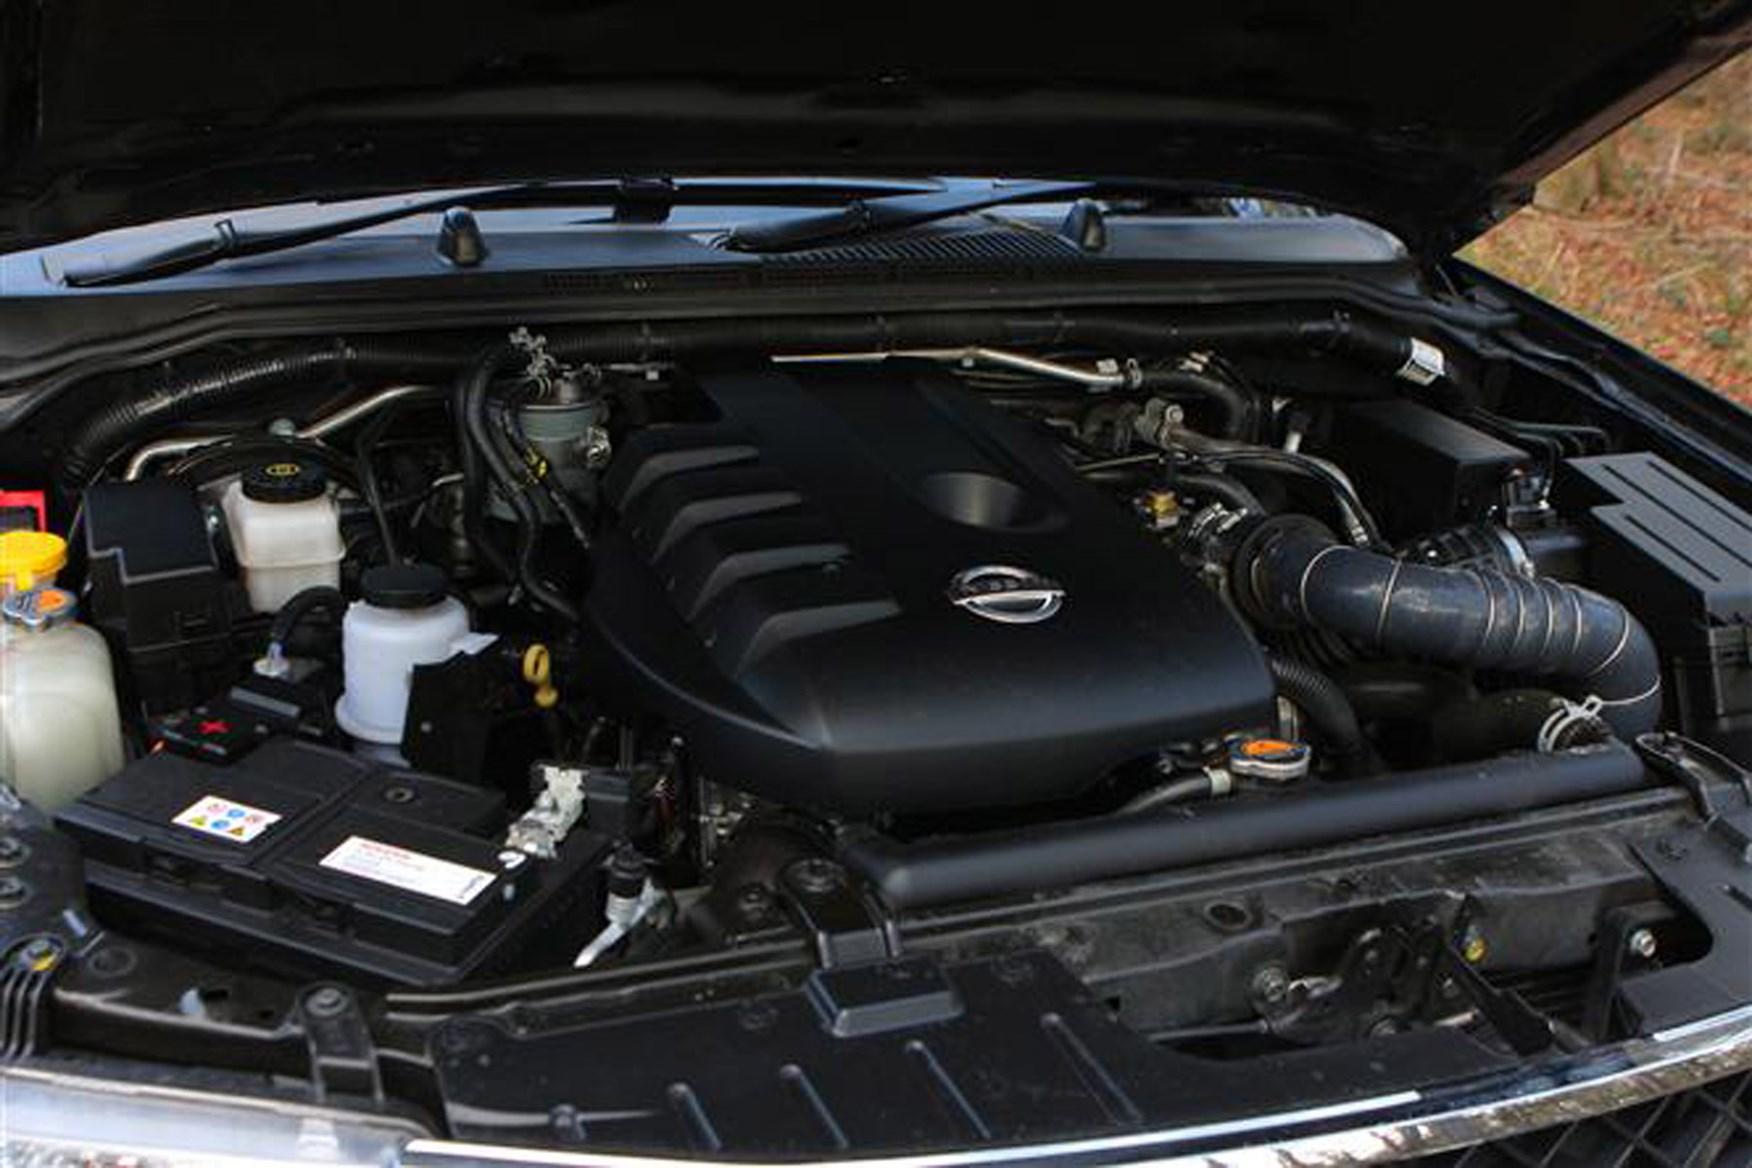 Nissan Navara 2005-2015 review on Parkers Vans - engine